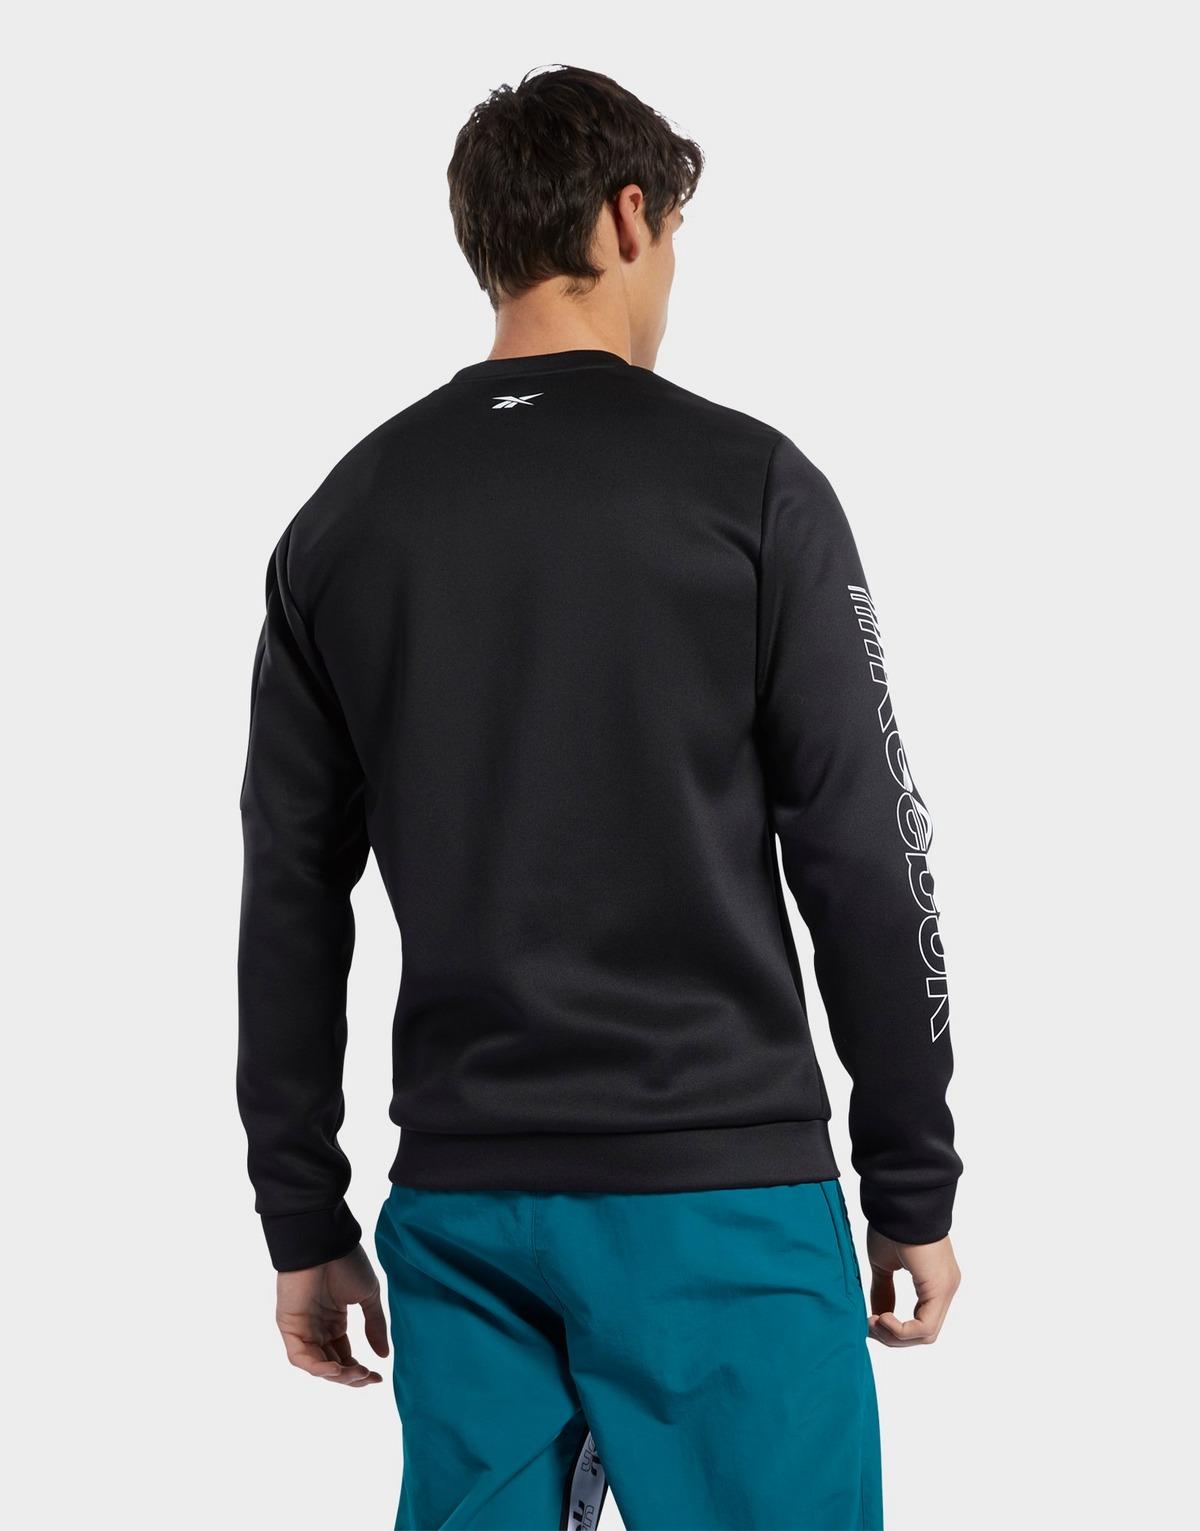 Reebok Meet You There Crew Sweatshirt